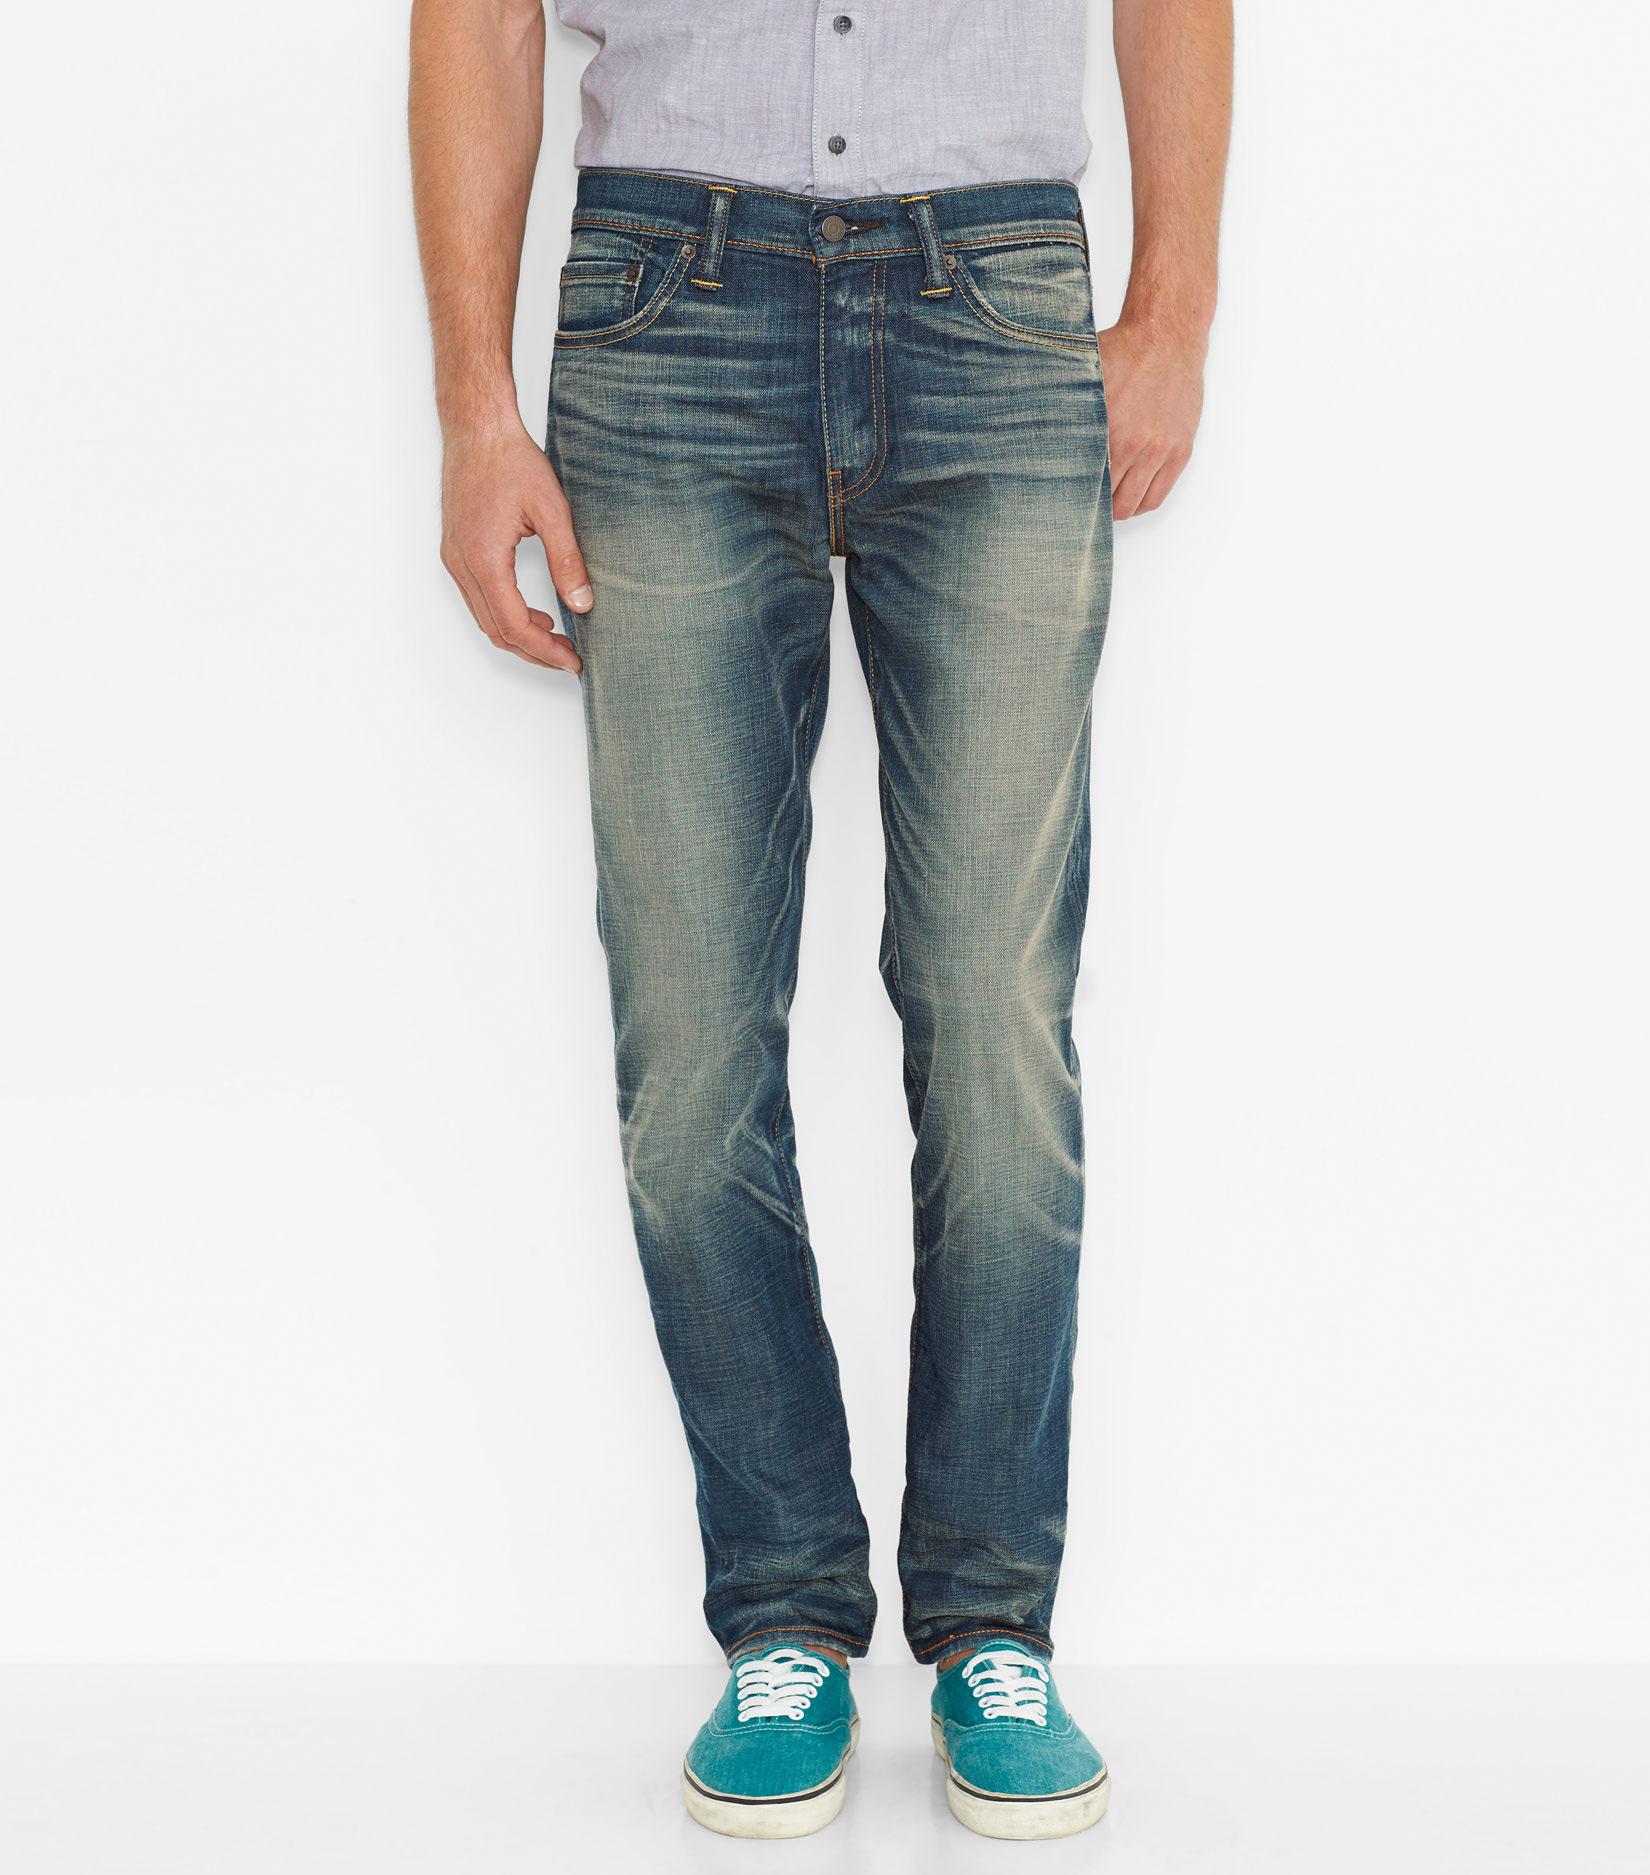 Slim fitting jeans | Sheknows.com